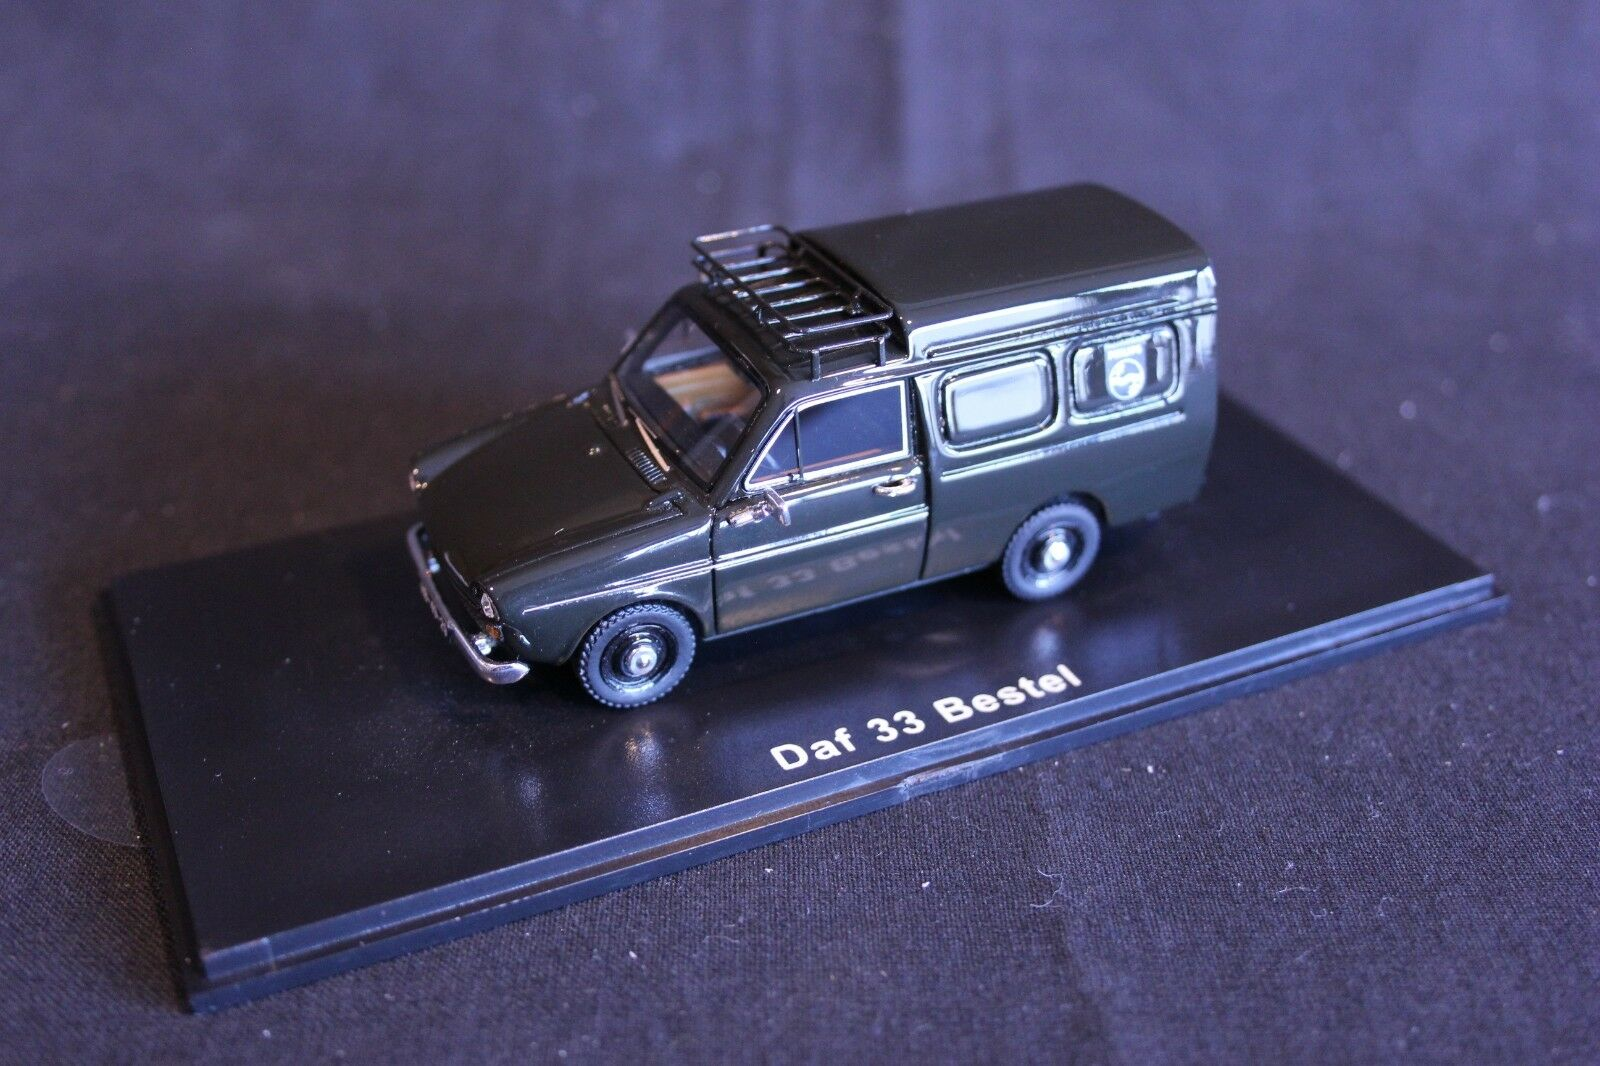 QSP Model Collection DAF 33 Bestel 1 43  Philips